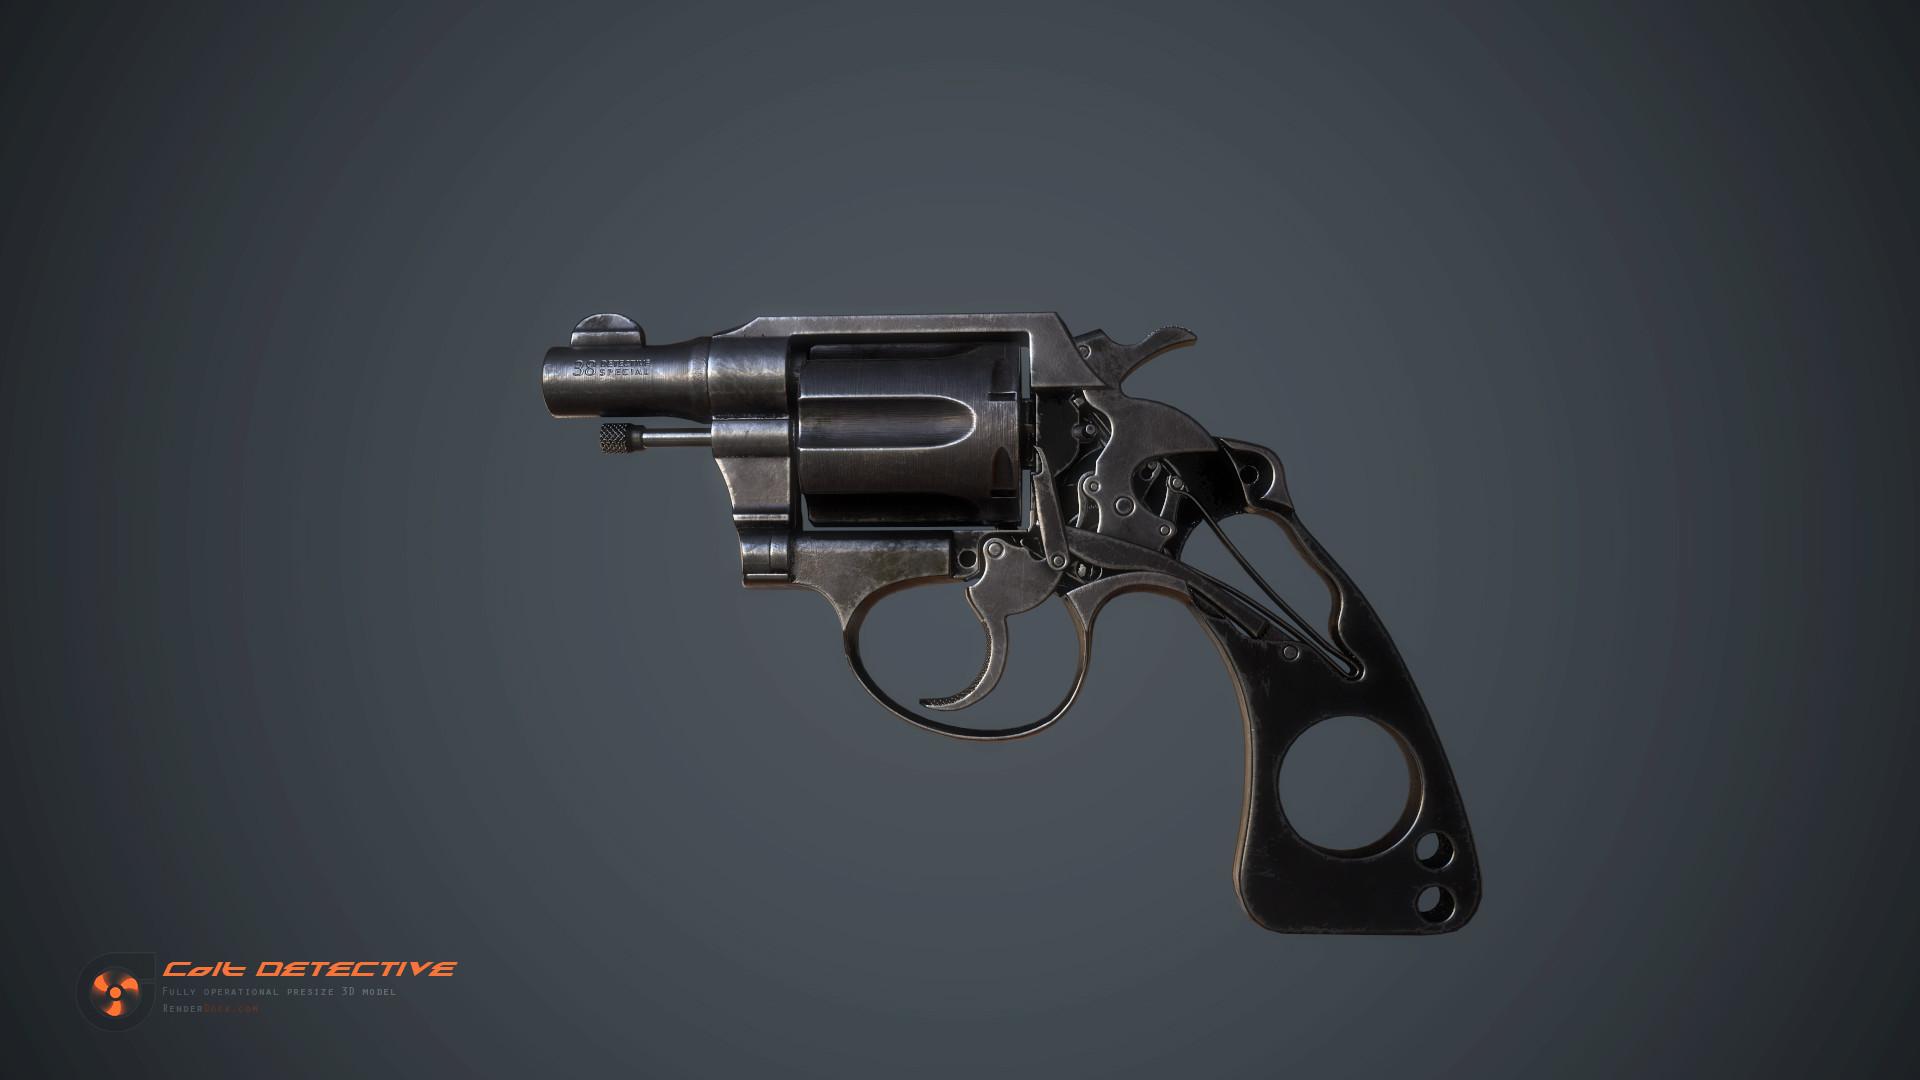 Renderdock studio colt detective detail05